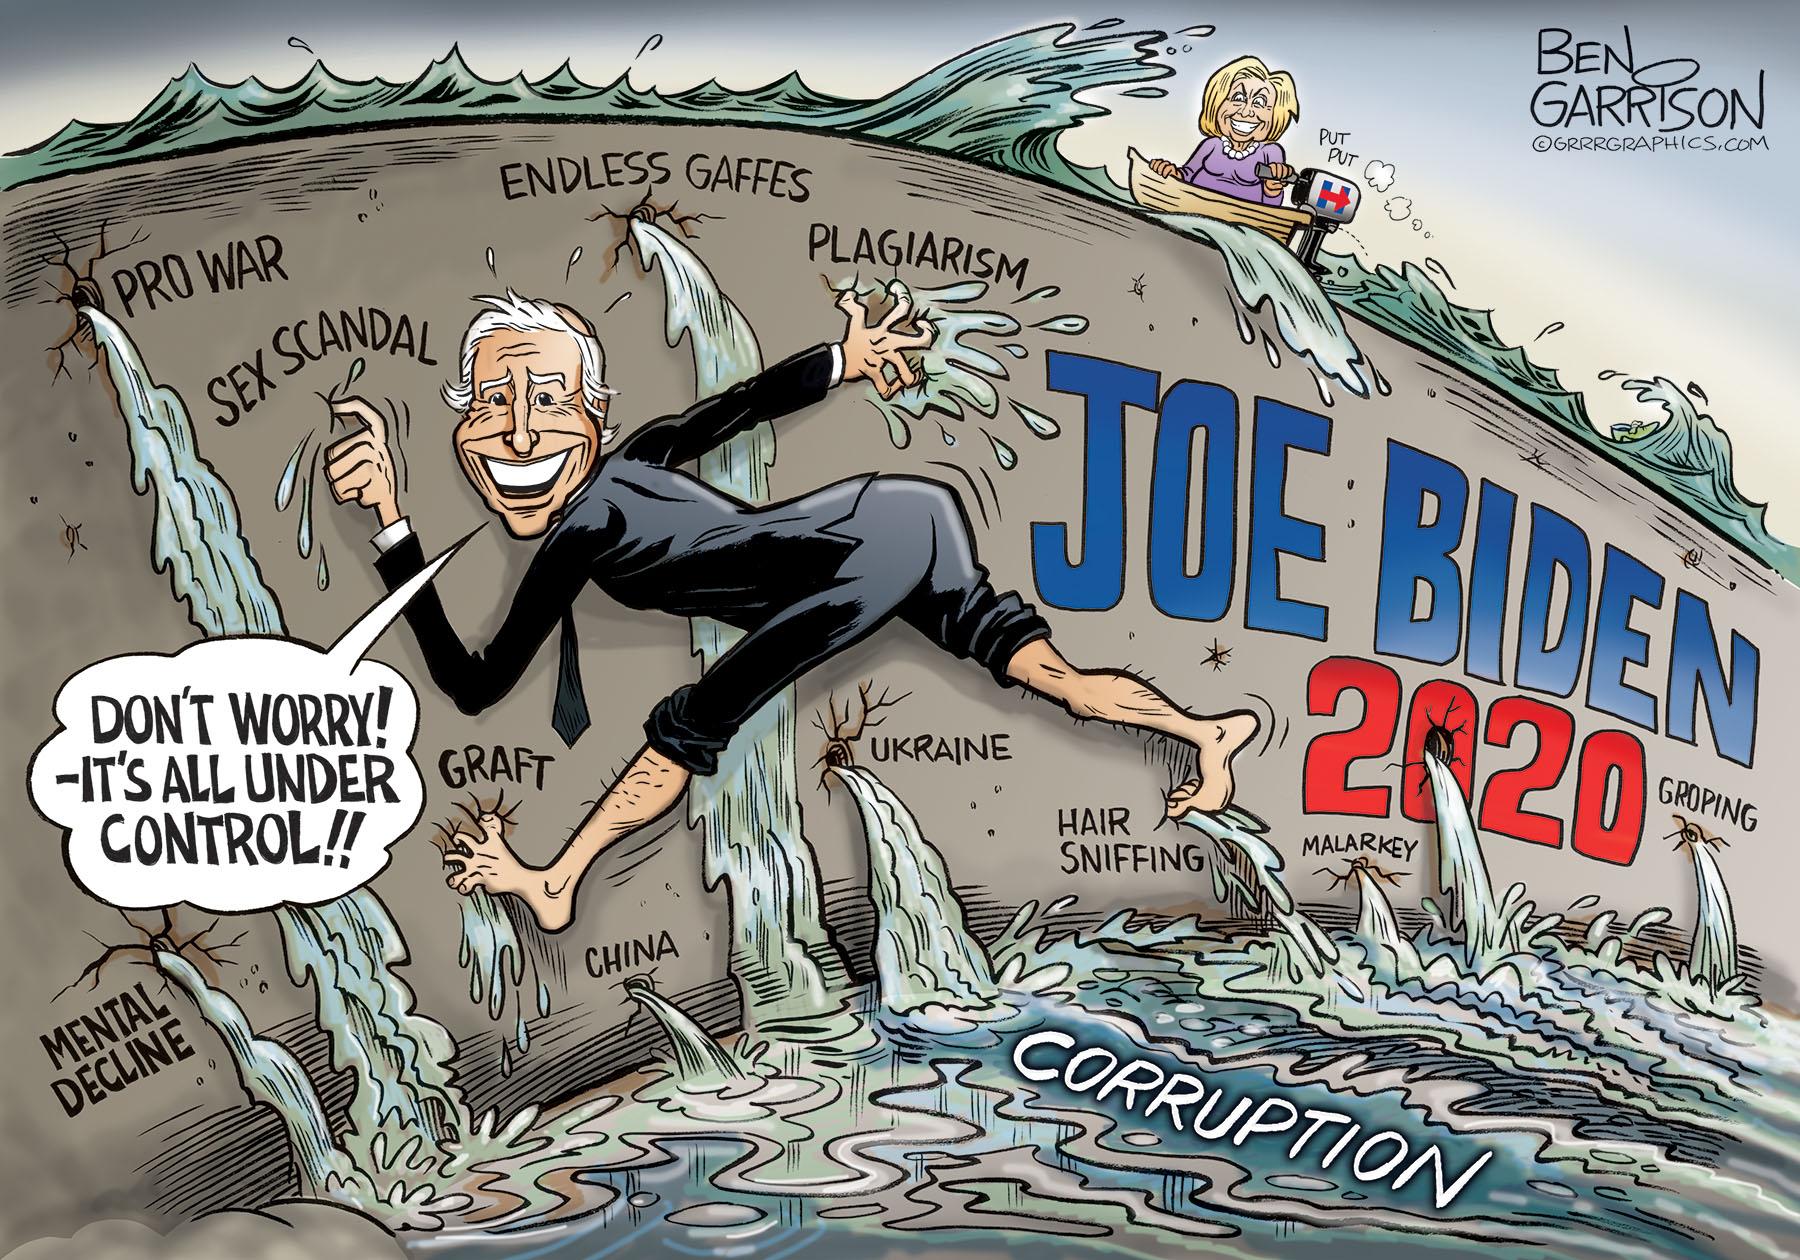 Joe Biden plugs the dike - ben garrison cartoon